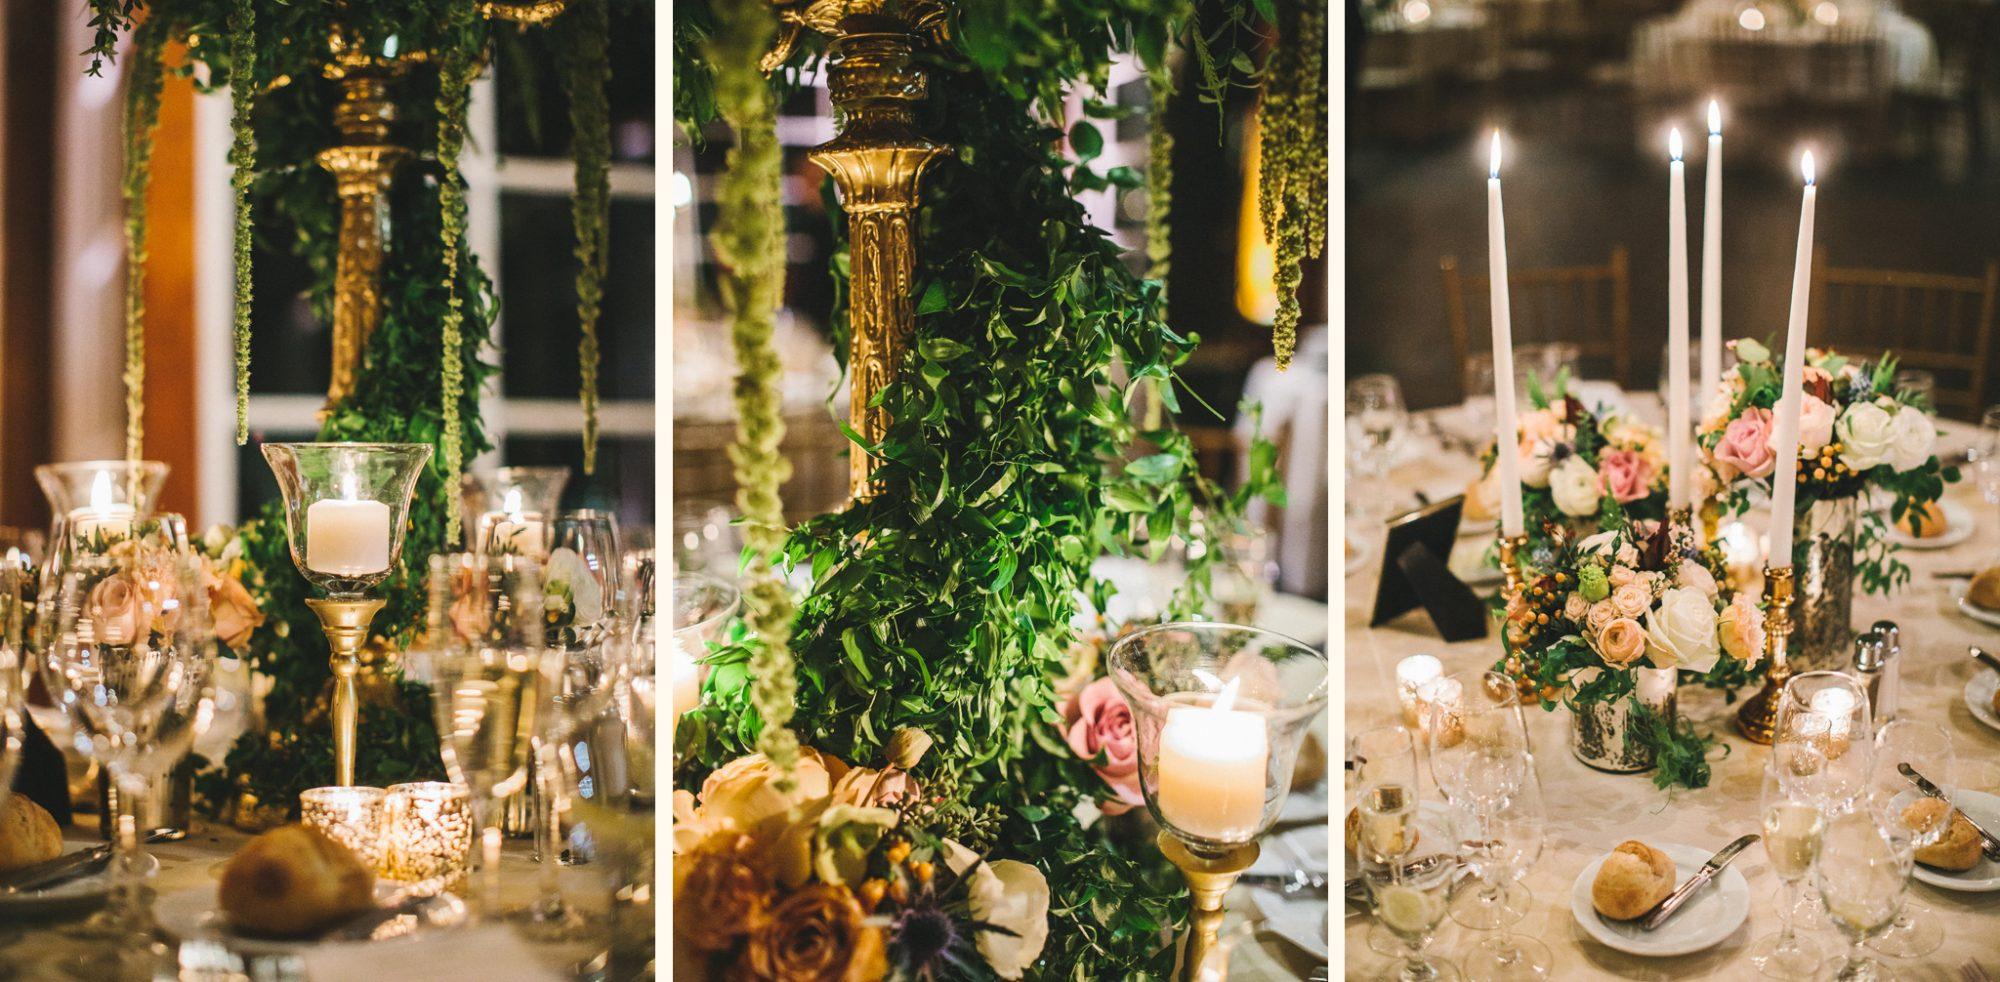 Lenox Hill Florist Reception Details At Central Park Boathouse Wedding Photo By Edward Winter